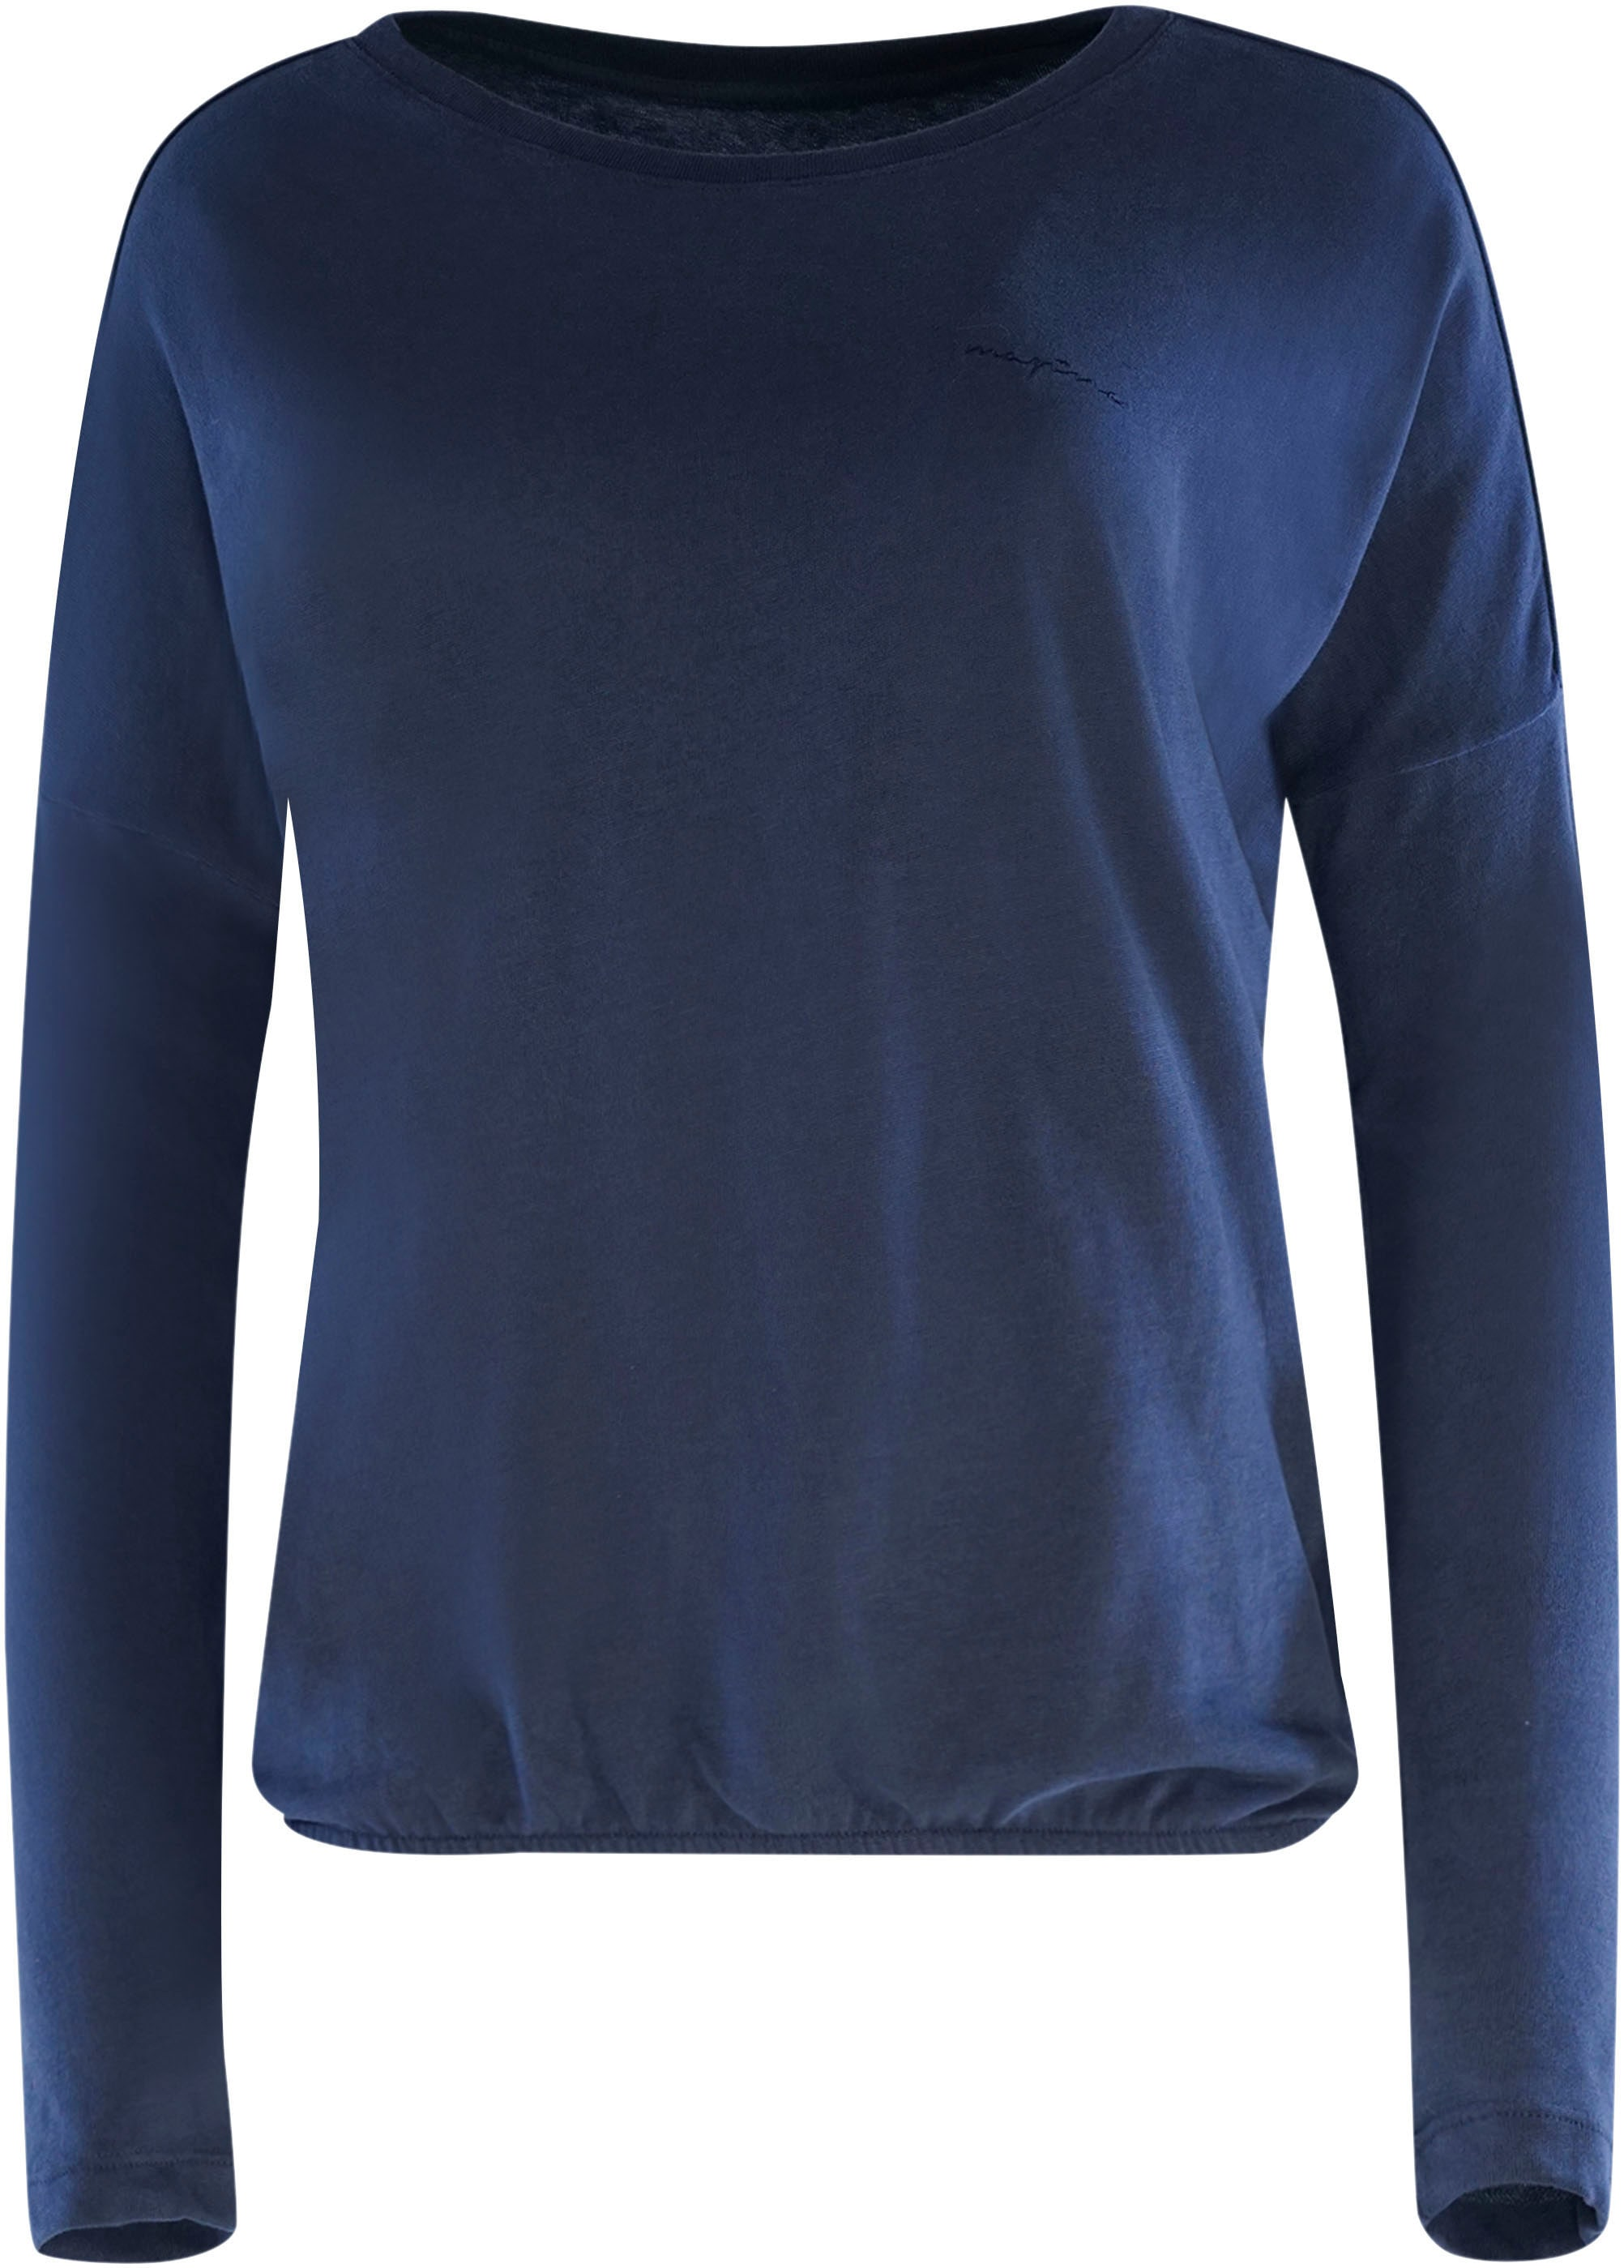 mazine -  T-Shirt Celeste, sportives Shirt mit Gummizug-Saum